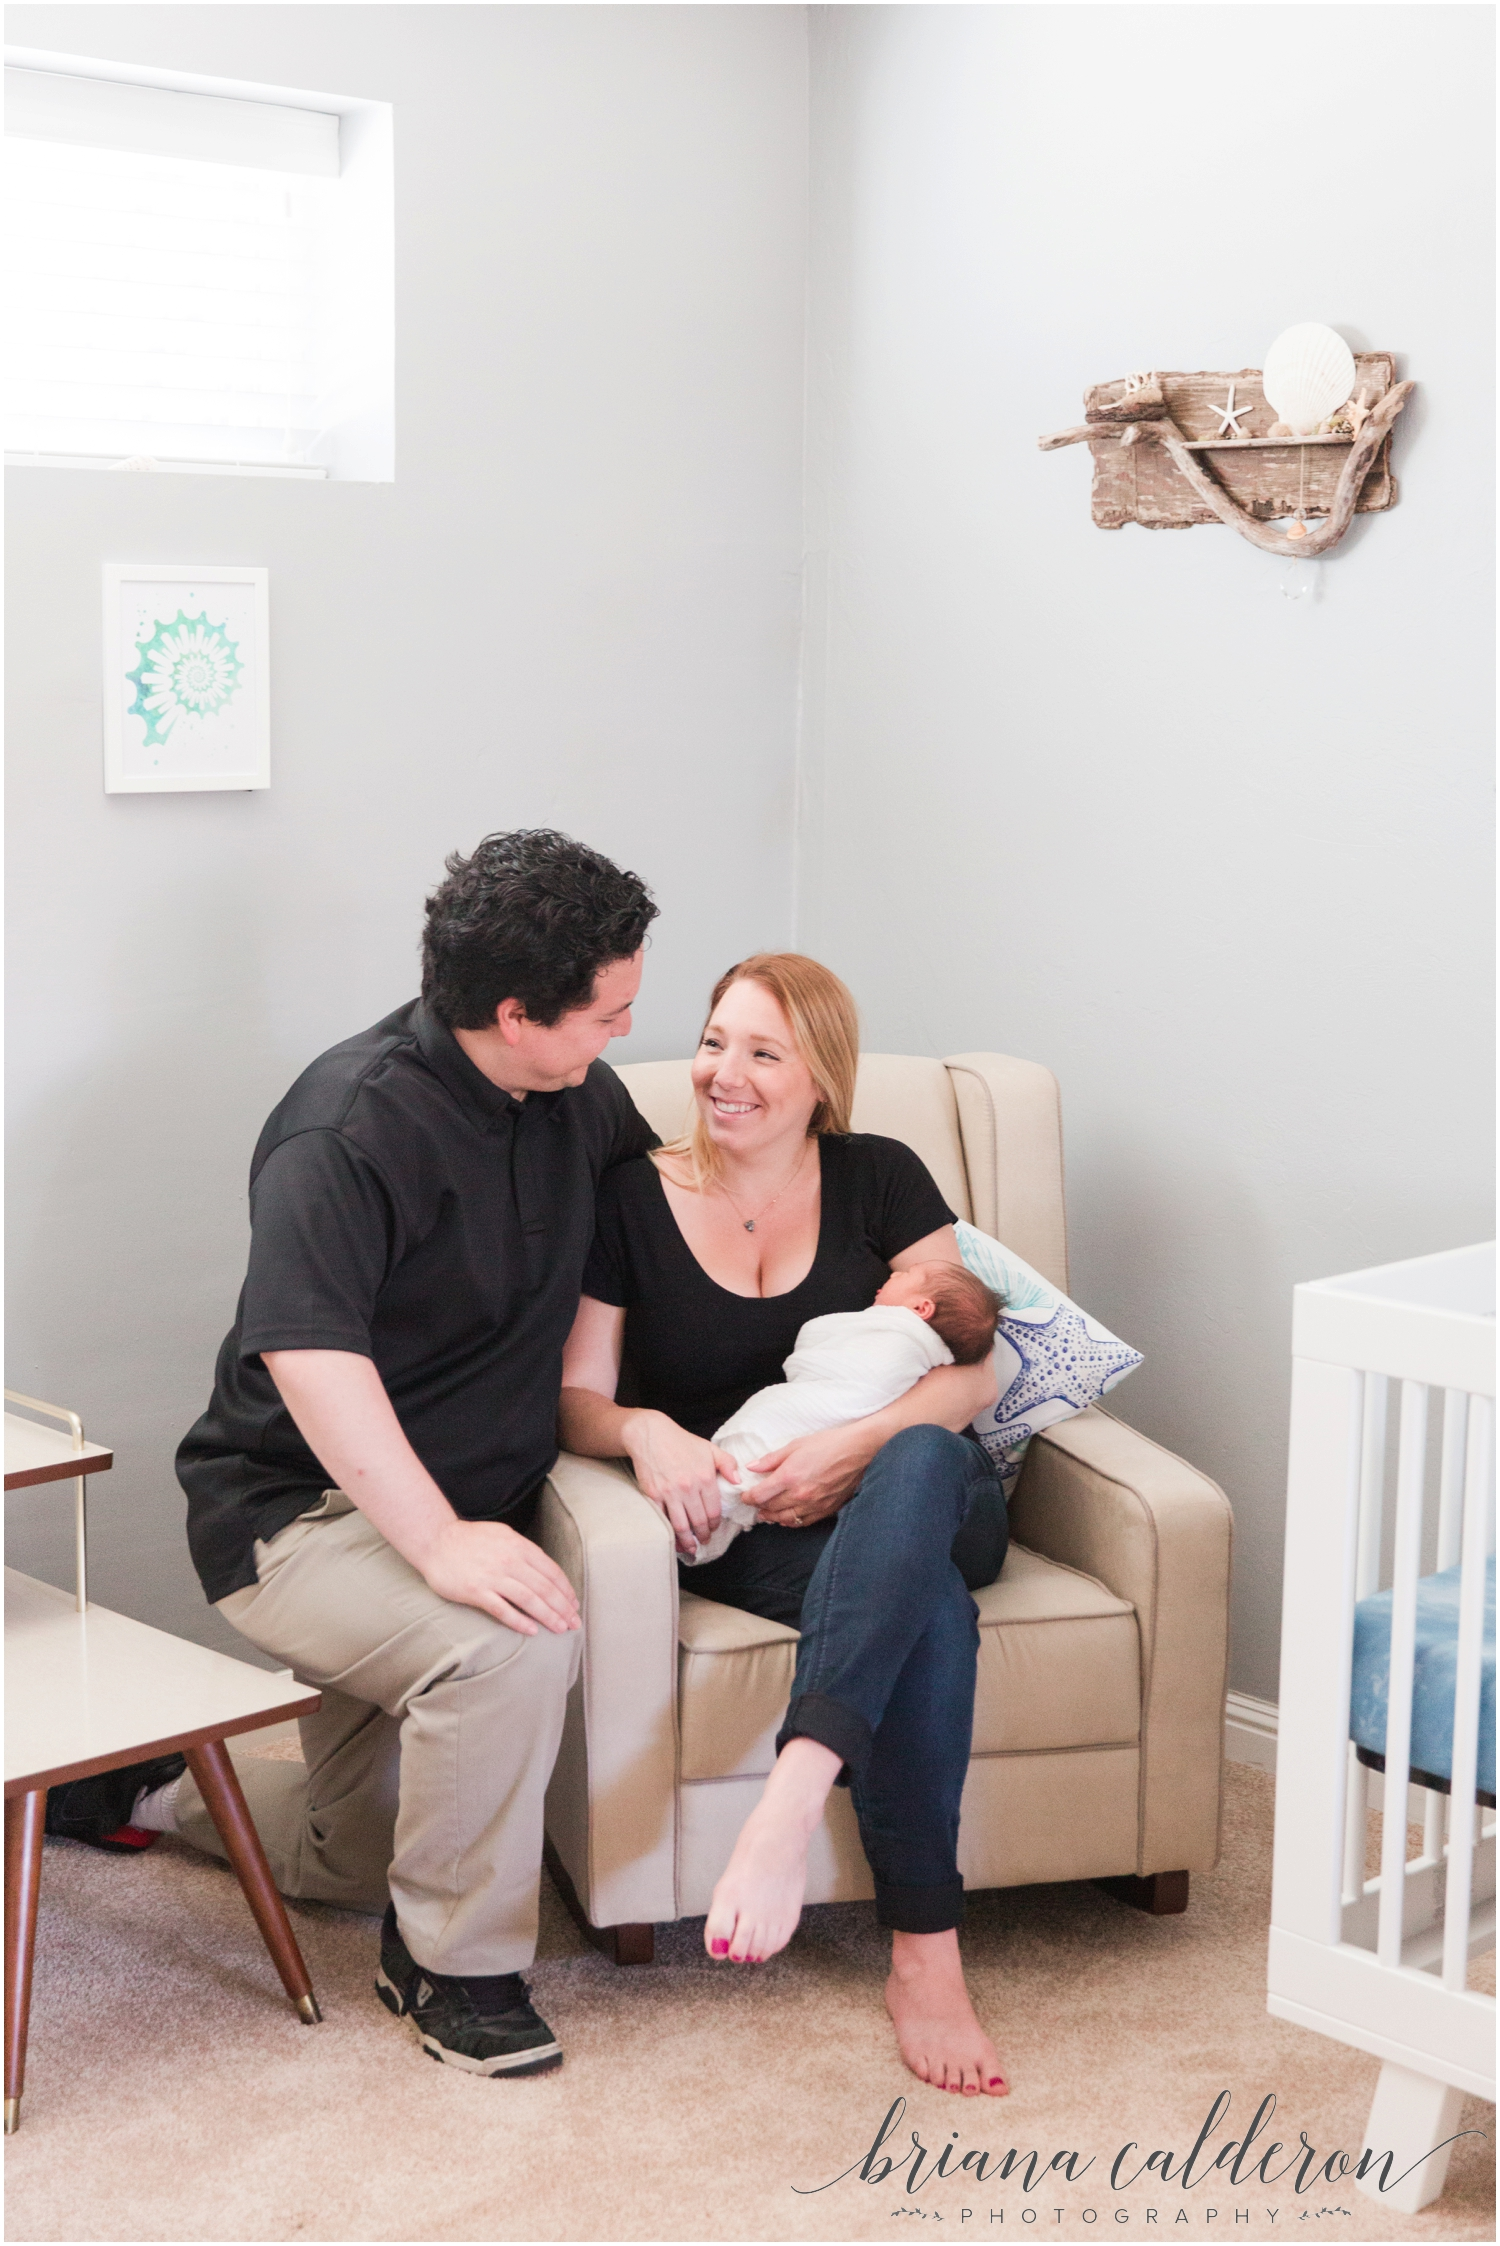 Lifestyle home newborn photos by Briana Calderon Photography_0857.jpg